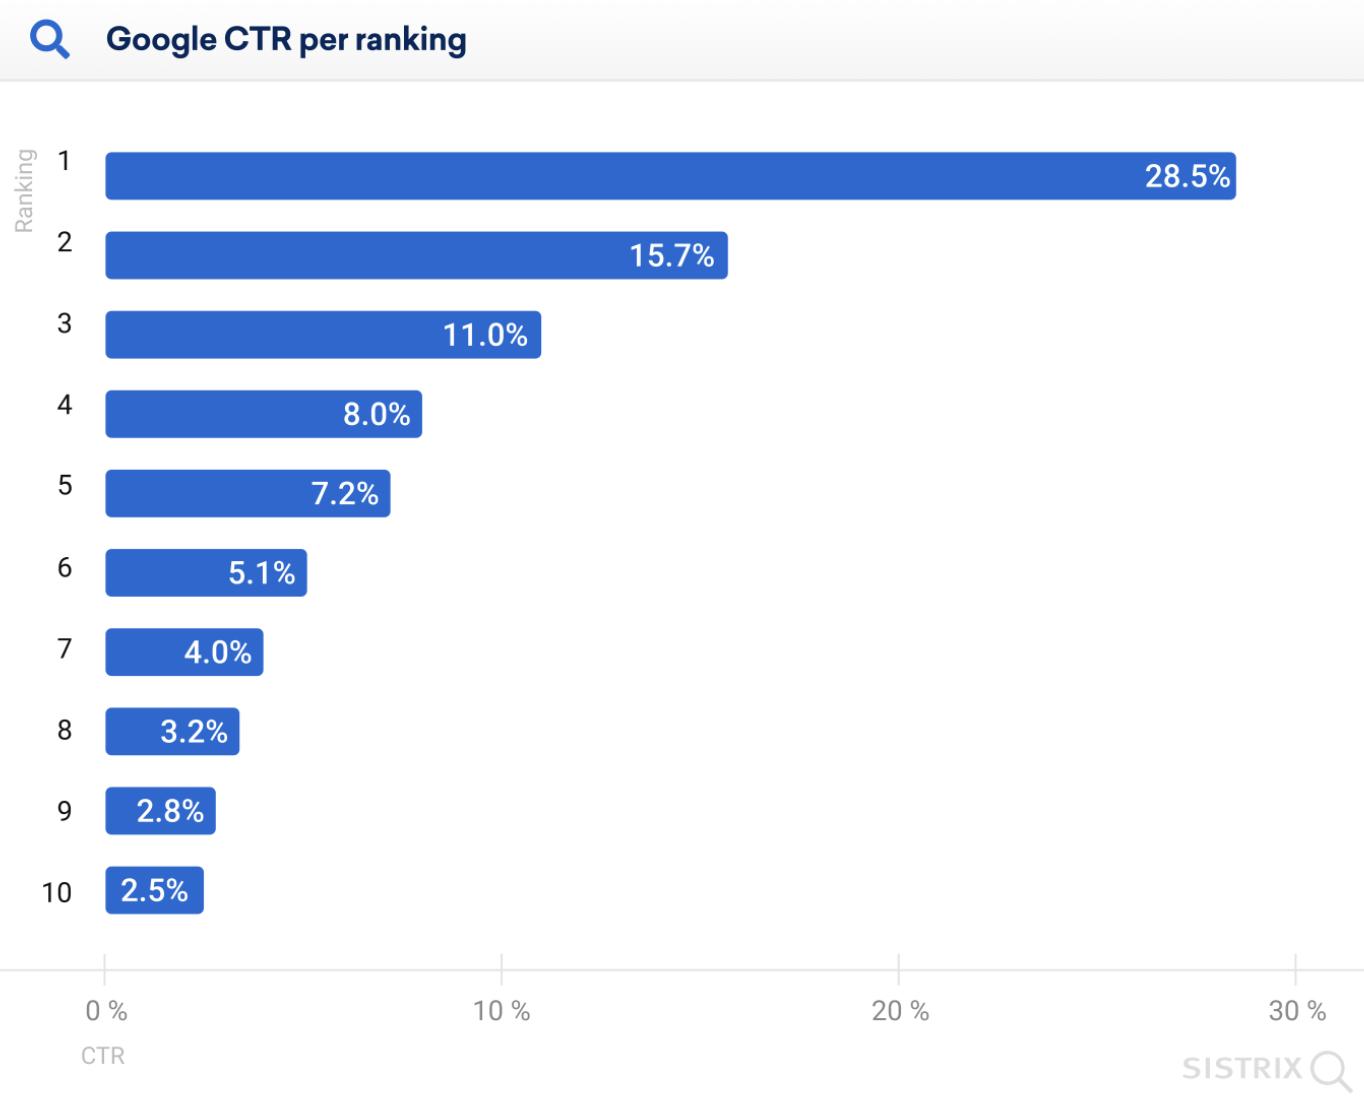 google traffic share per ranking